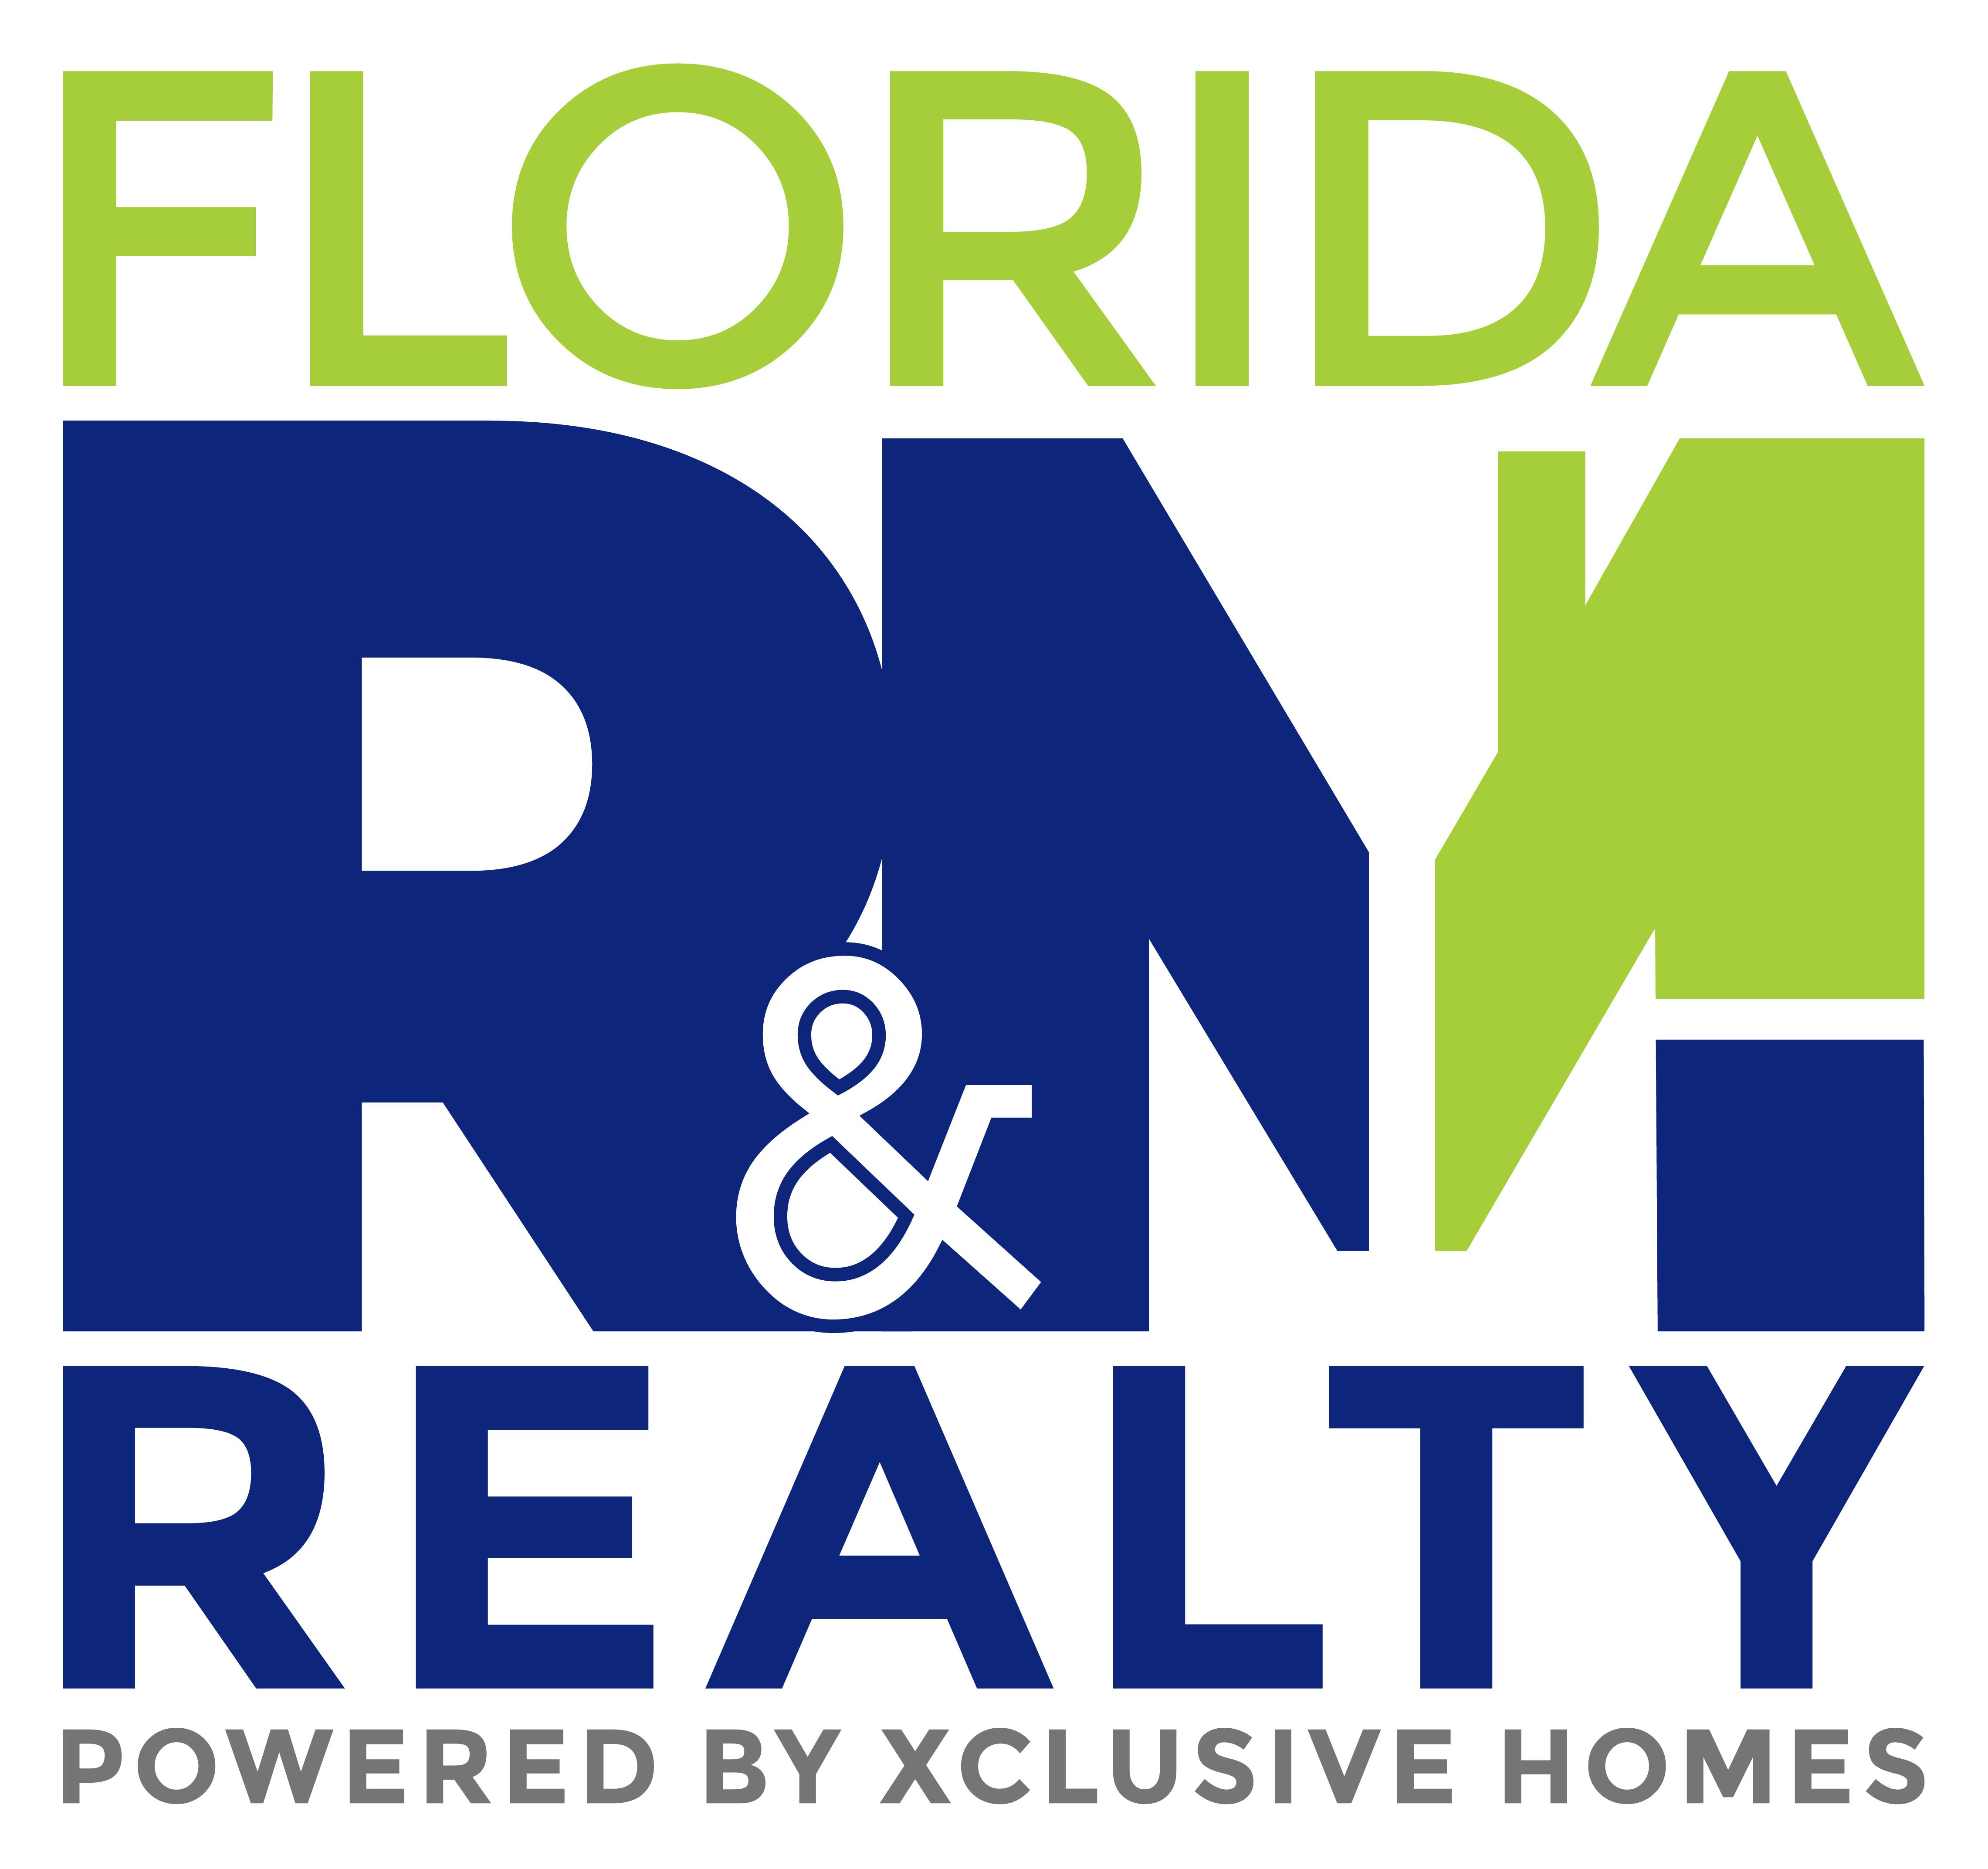 Florida R&N Realty Florida R&N Realty